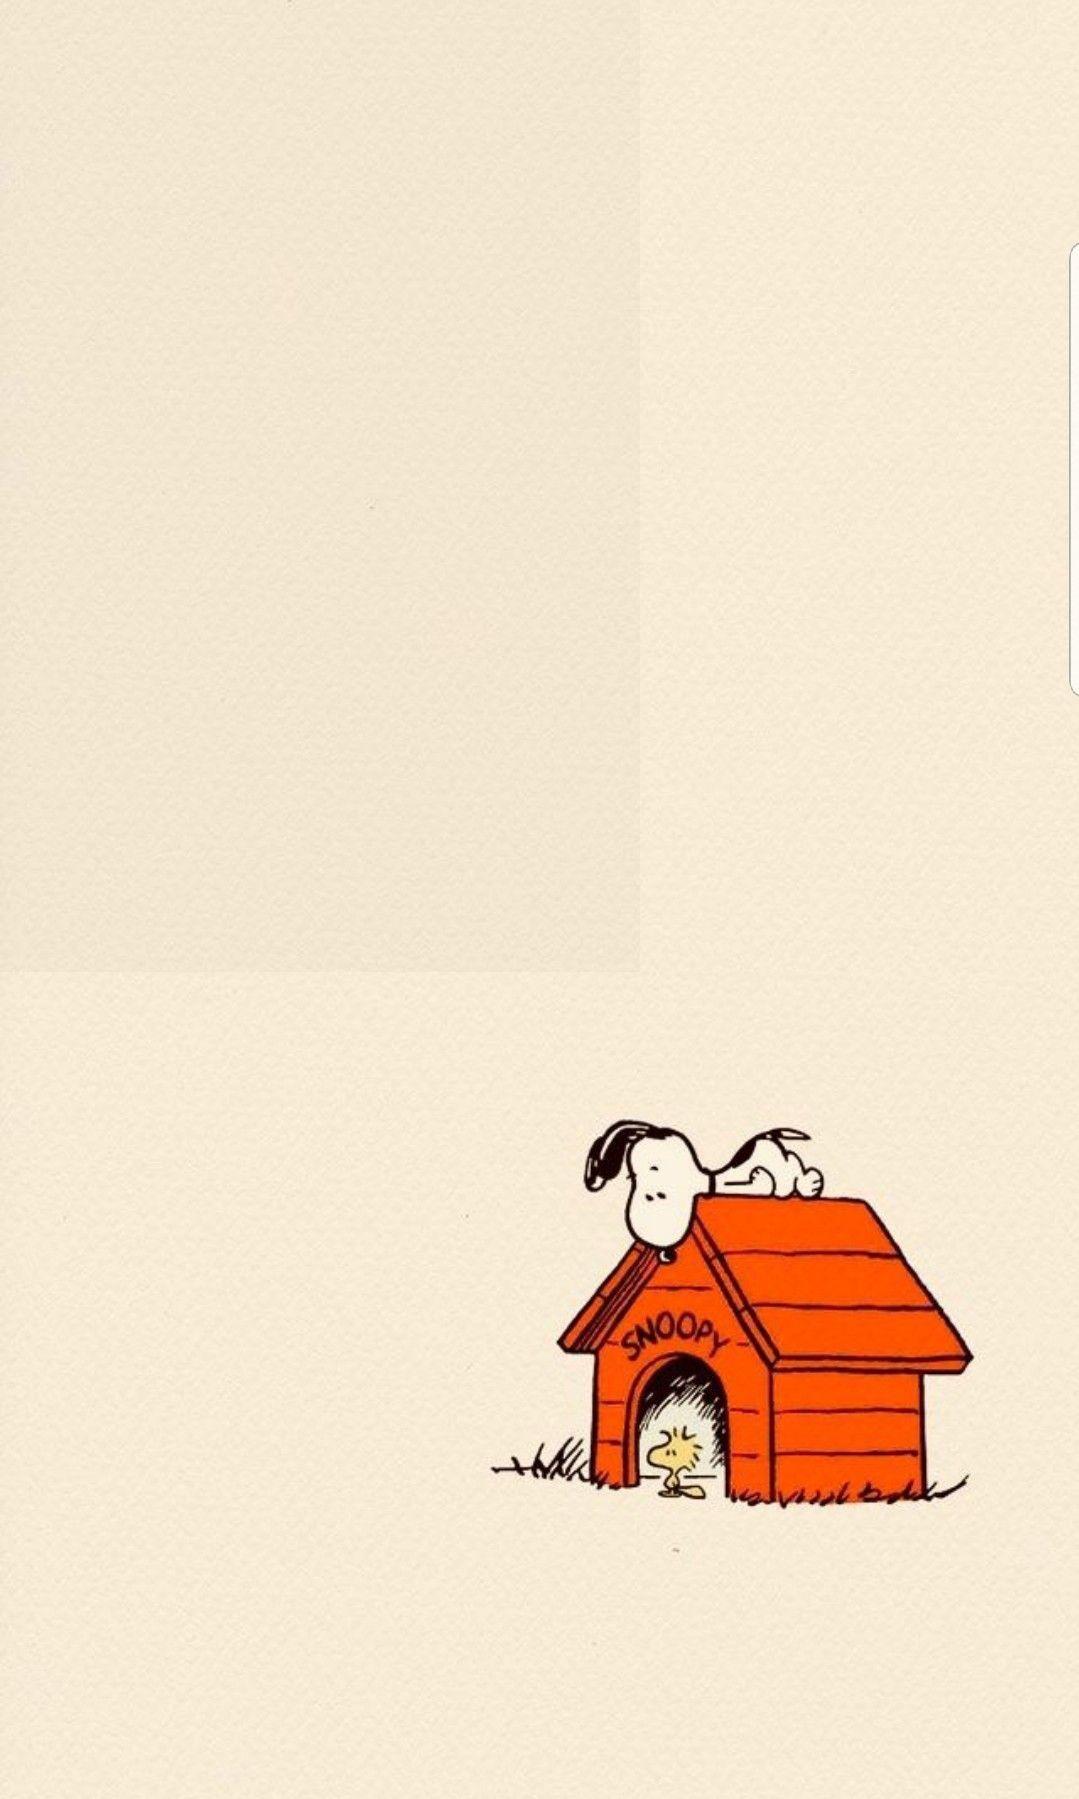 Pin by 于葸 詹 on snoopy Snoopy wallpaper, Cartoon